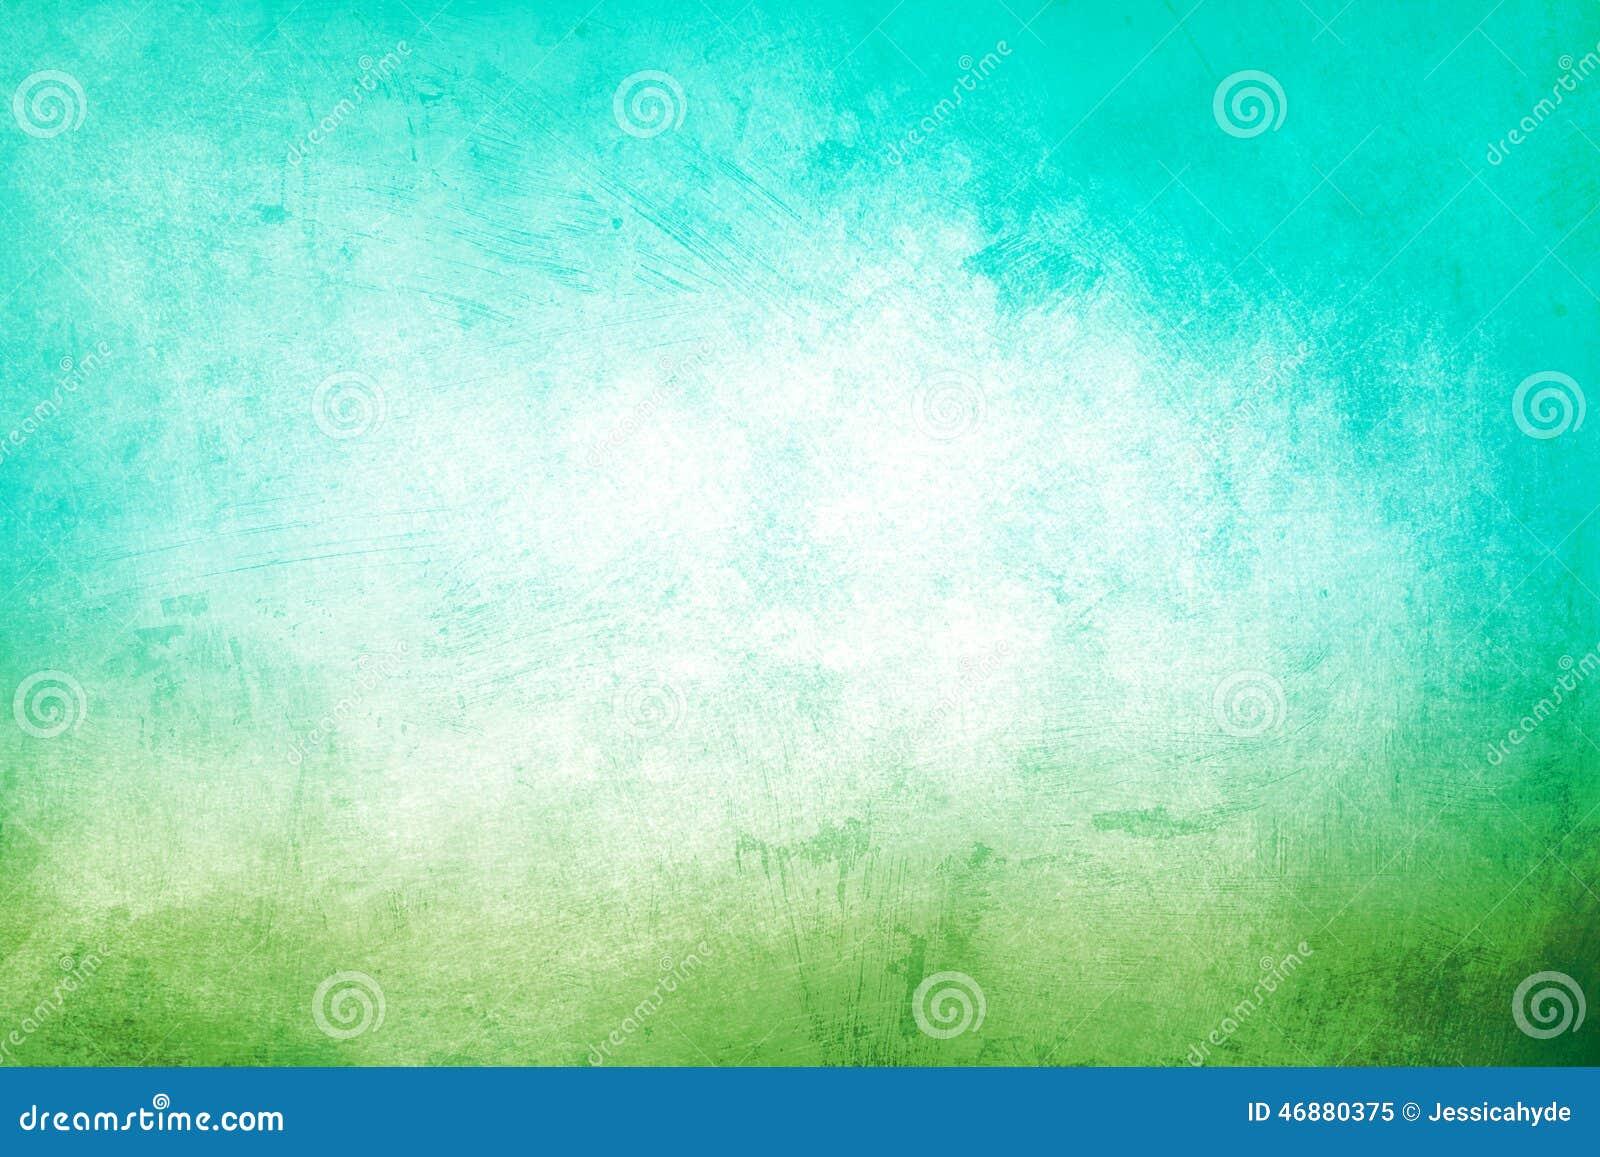 green grunge texture thumb - photo #37